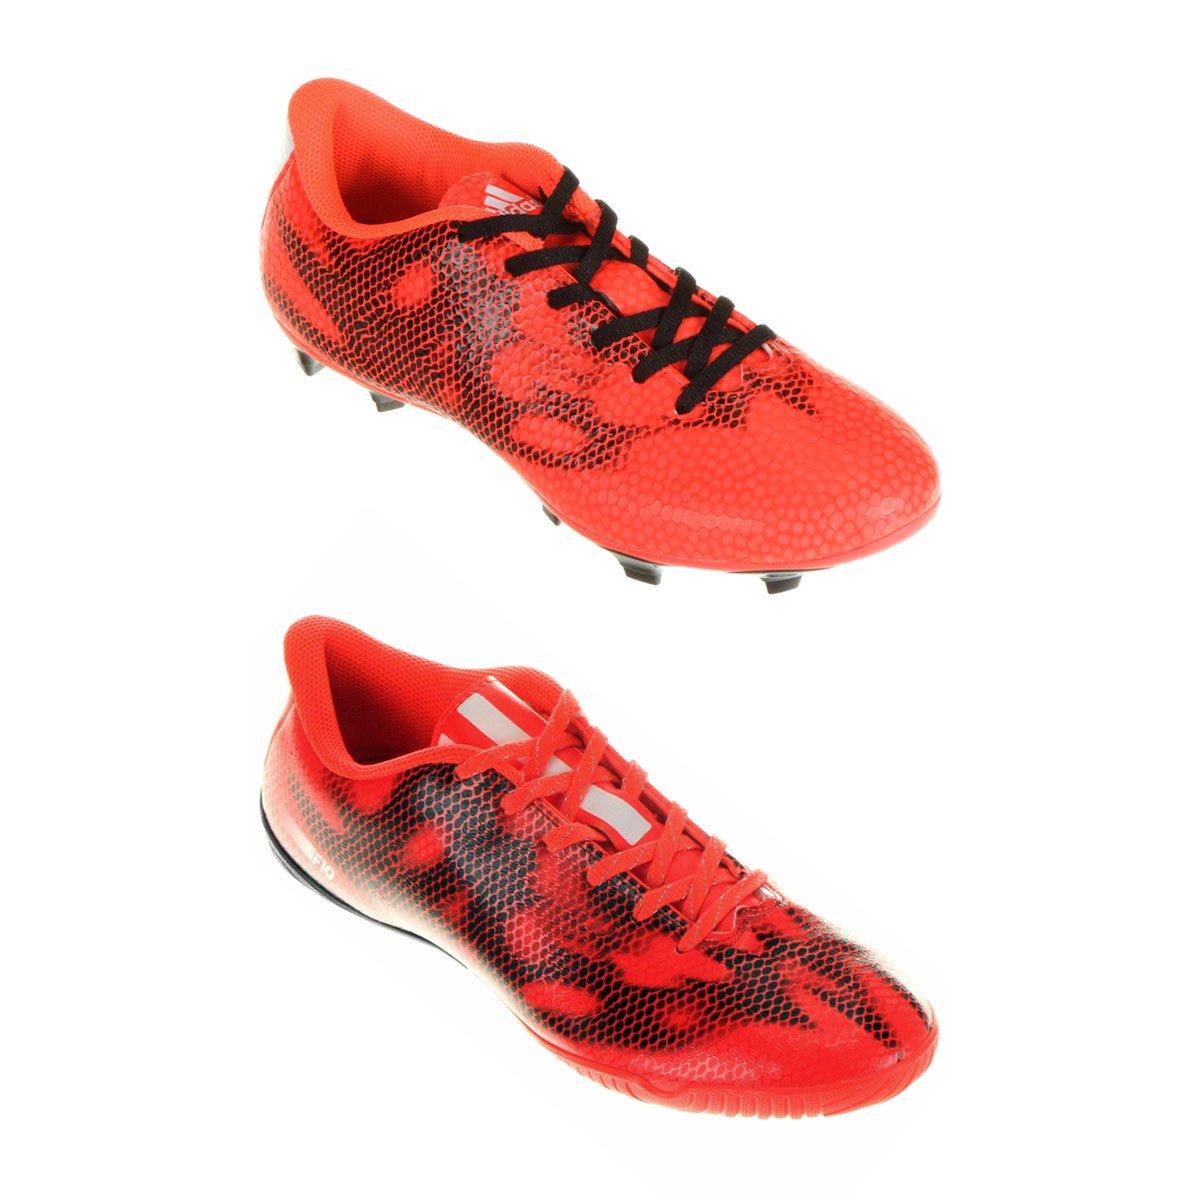 af153623fb Kit Chuteira Adidas F10 IN Futsal + Chuteira Adidas F5 FG Campo - Compre  Agora